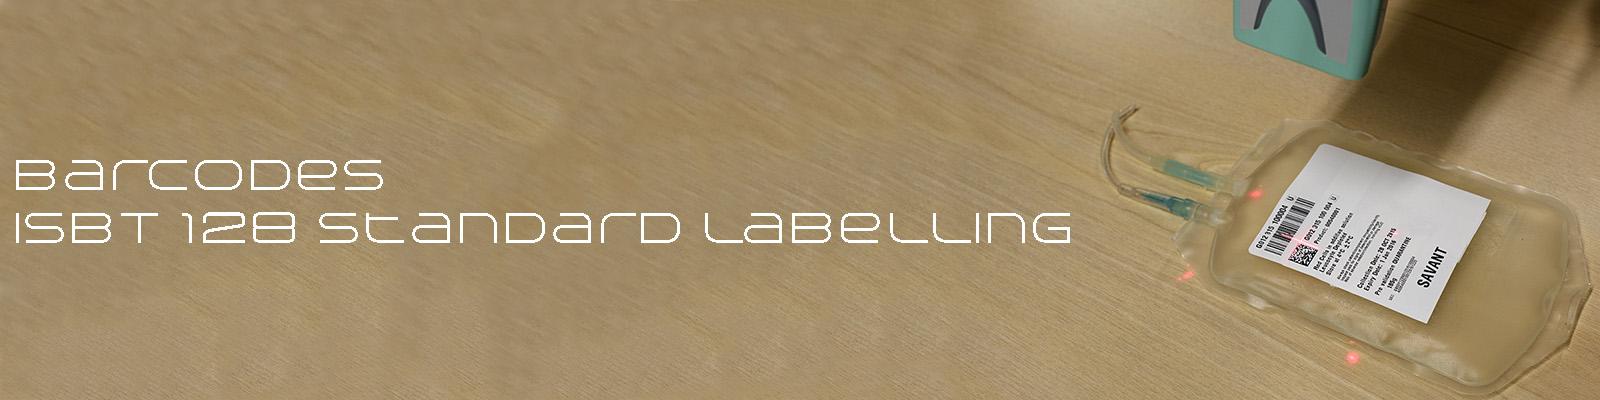 Savant supply ISBT 128 standard barcode labelling software